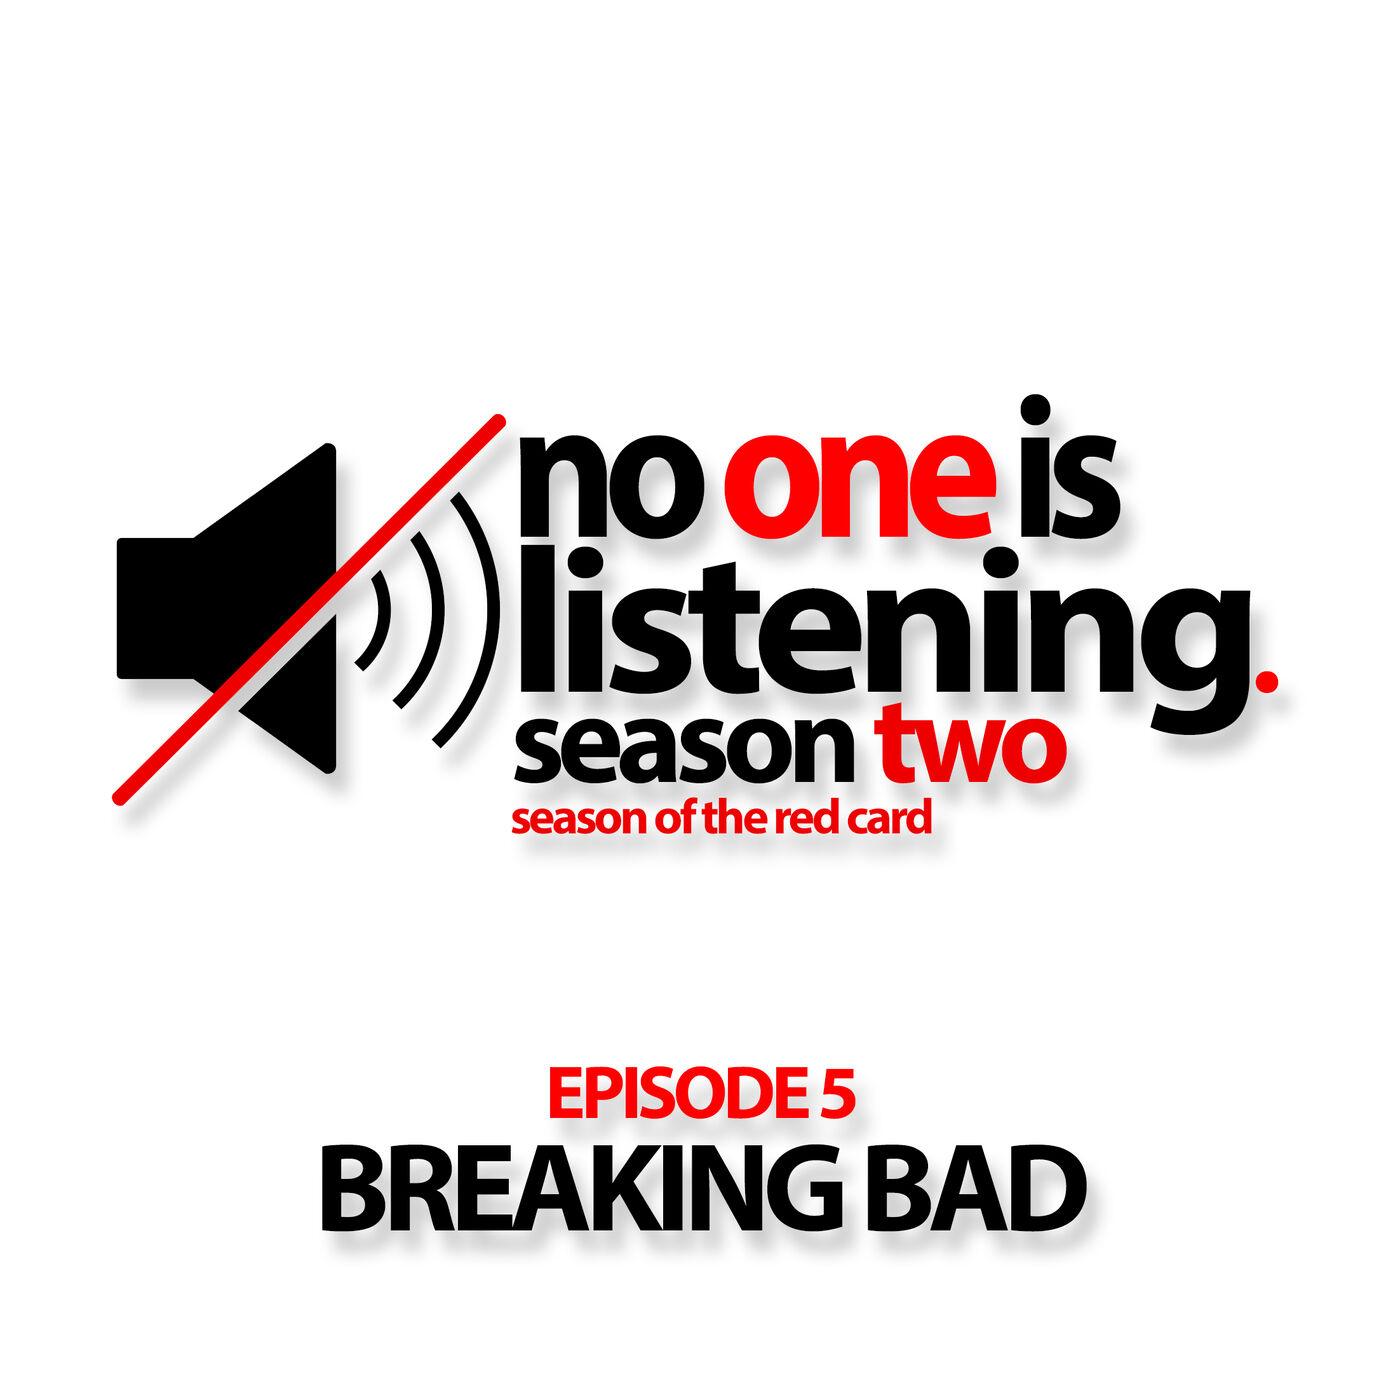 S2E5 Breaking Bad